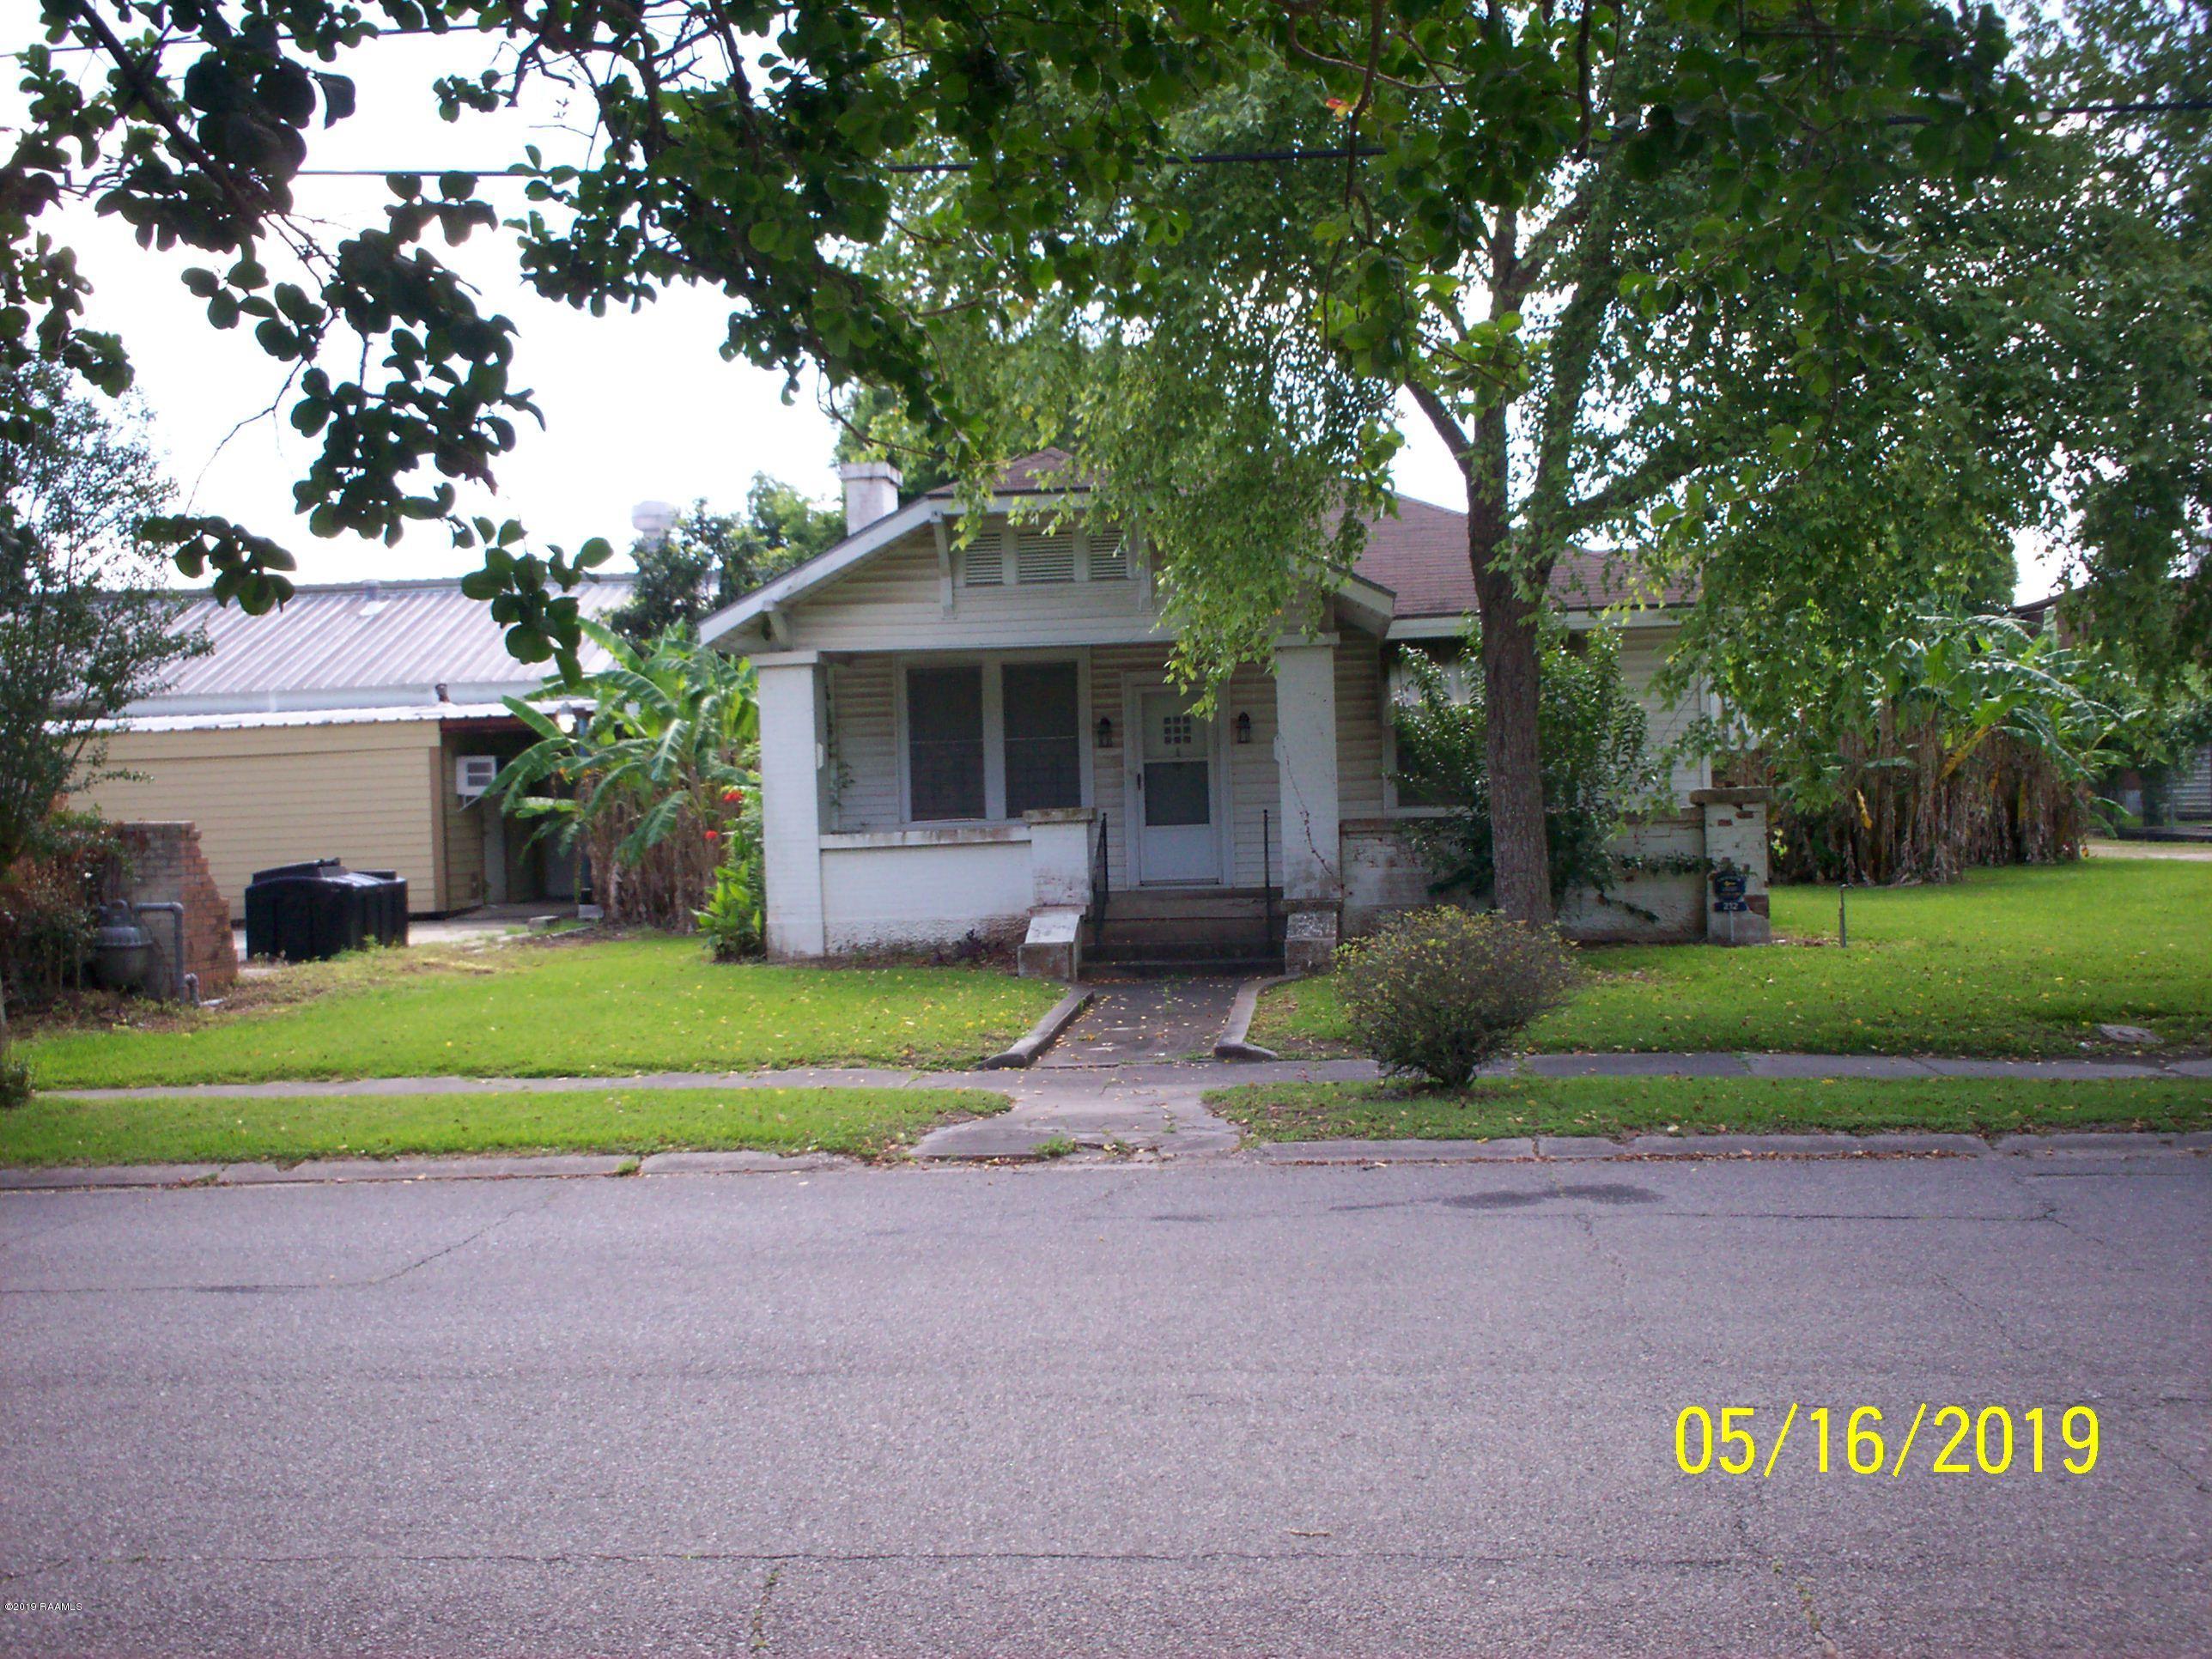 212 Washington Street, St. Martinville, LA 70582 Photo #1